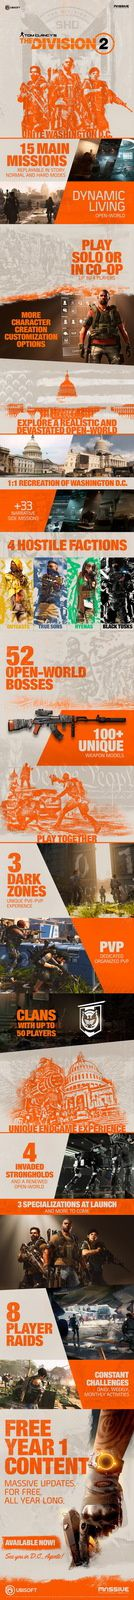 [ACTUALITE] TOM CLANCY'S THE DIVISION 2 - Un Accolade Trailer et une infographie